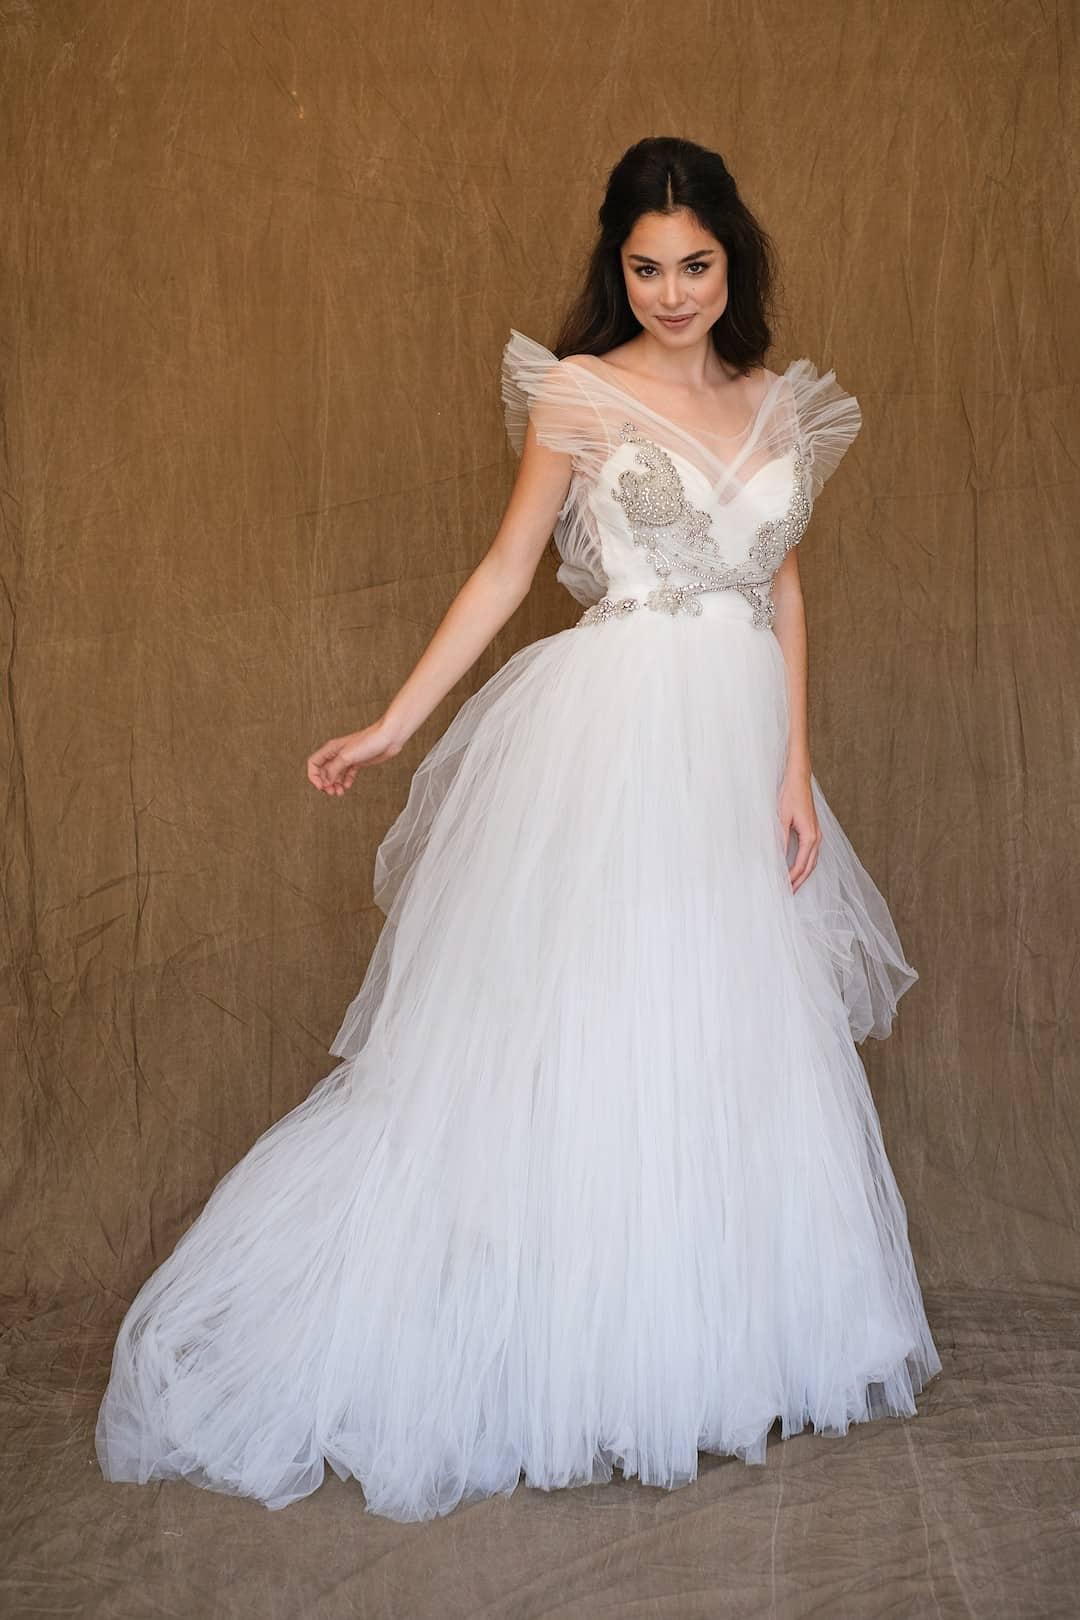 Romantic wedding dress - Marco&Maria - 14-1031-front